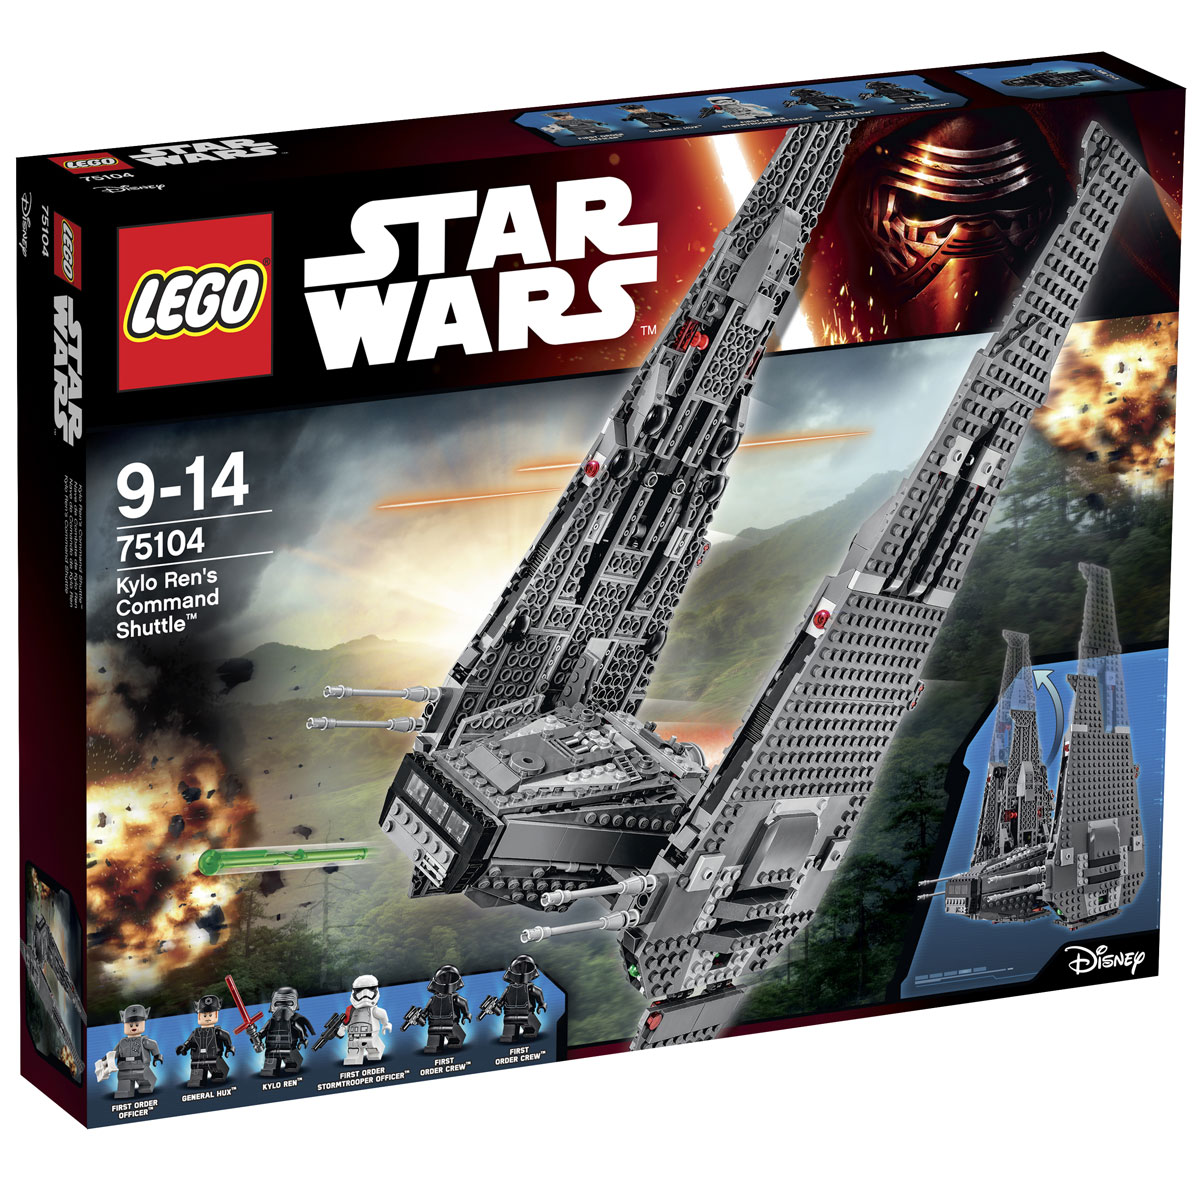 LEGO Star Wars Конструктор Командный шаттл Кайло Рена 75104 цена